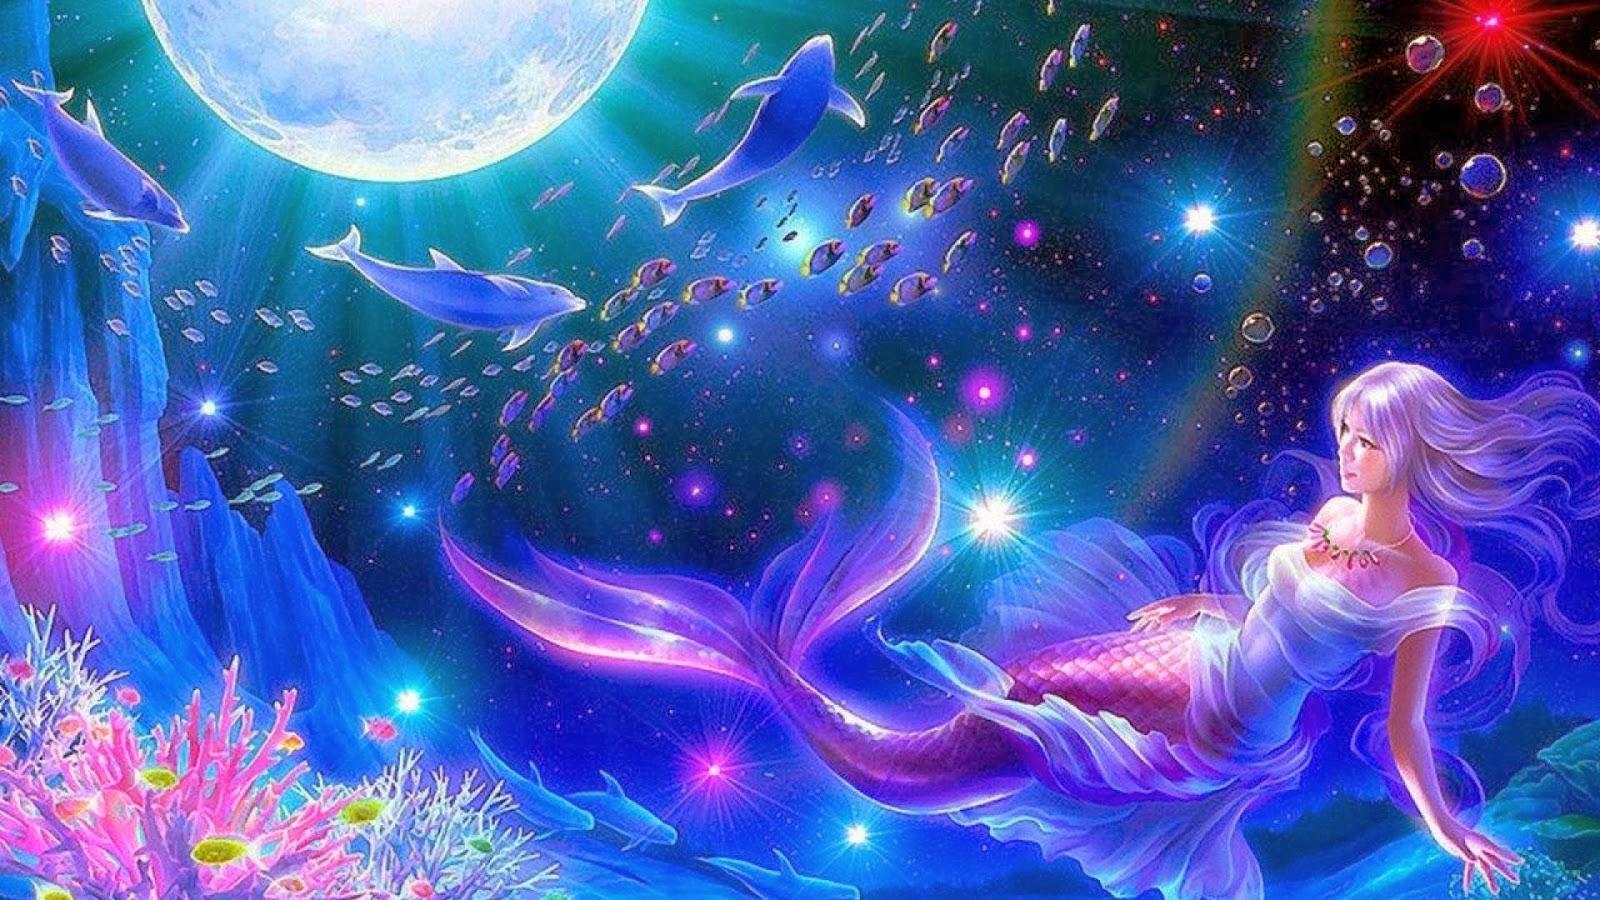 All new wallpaper : Mermaid moon fantasy widescreen hd wallpaper